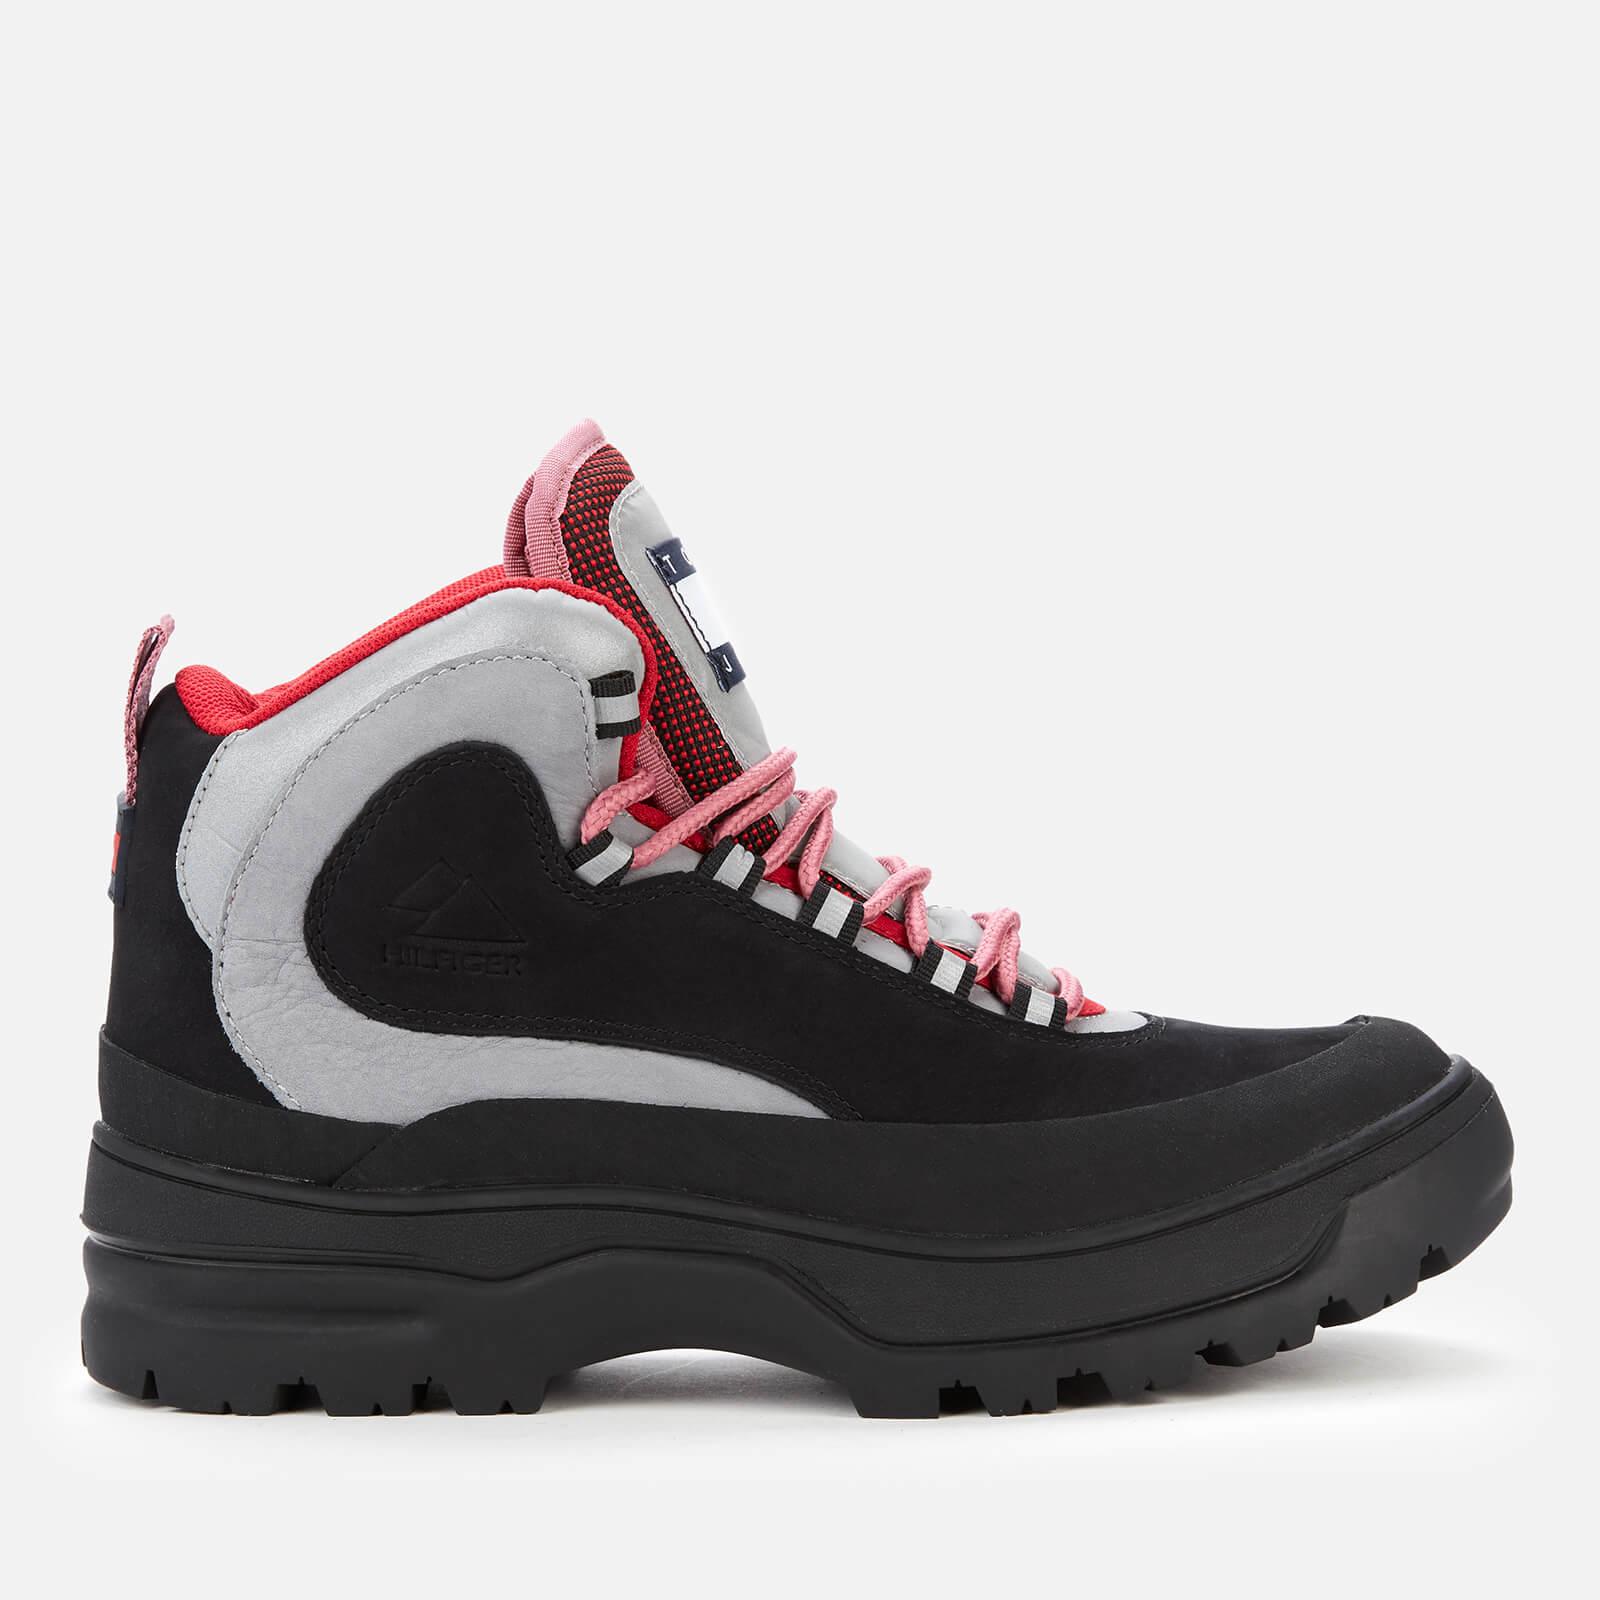 Tommy Jeans Women's Lace Up Boots - Black - Uk 3.5